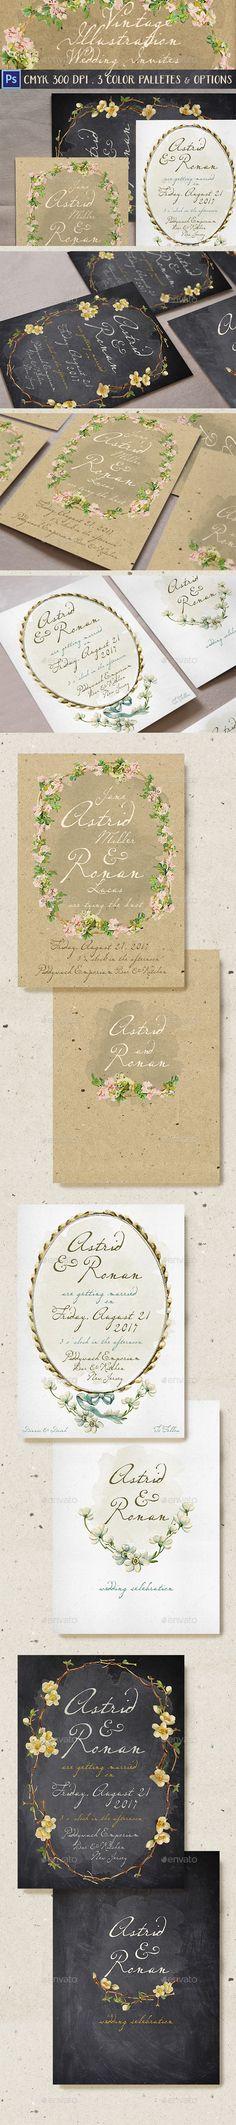 wedding invitation design psd%0A Msn Resume Template